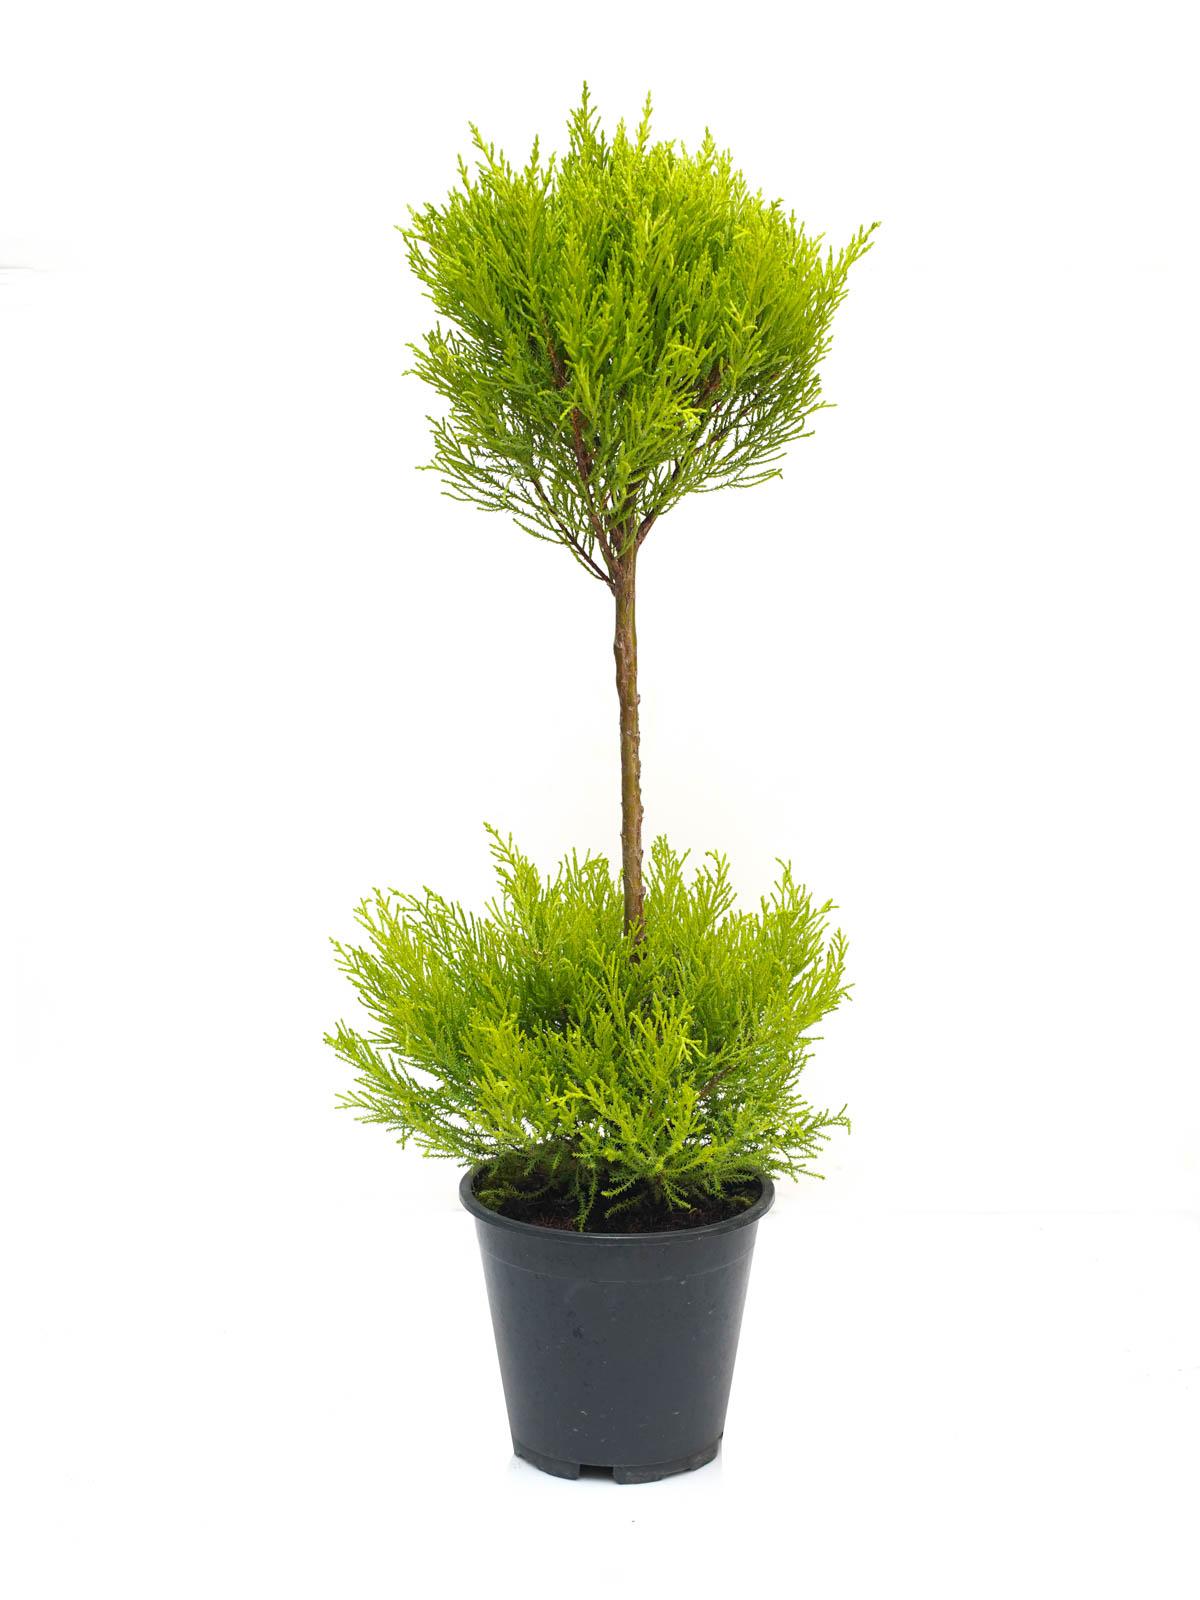 Cupressus Macrocarpa Gold Ball 'Indoor Plants'